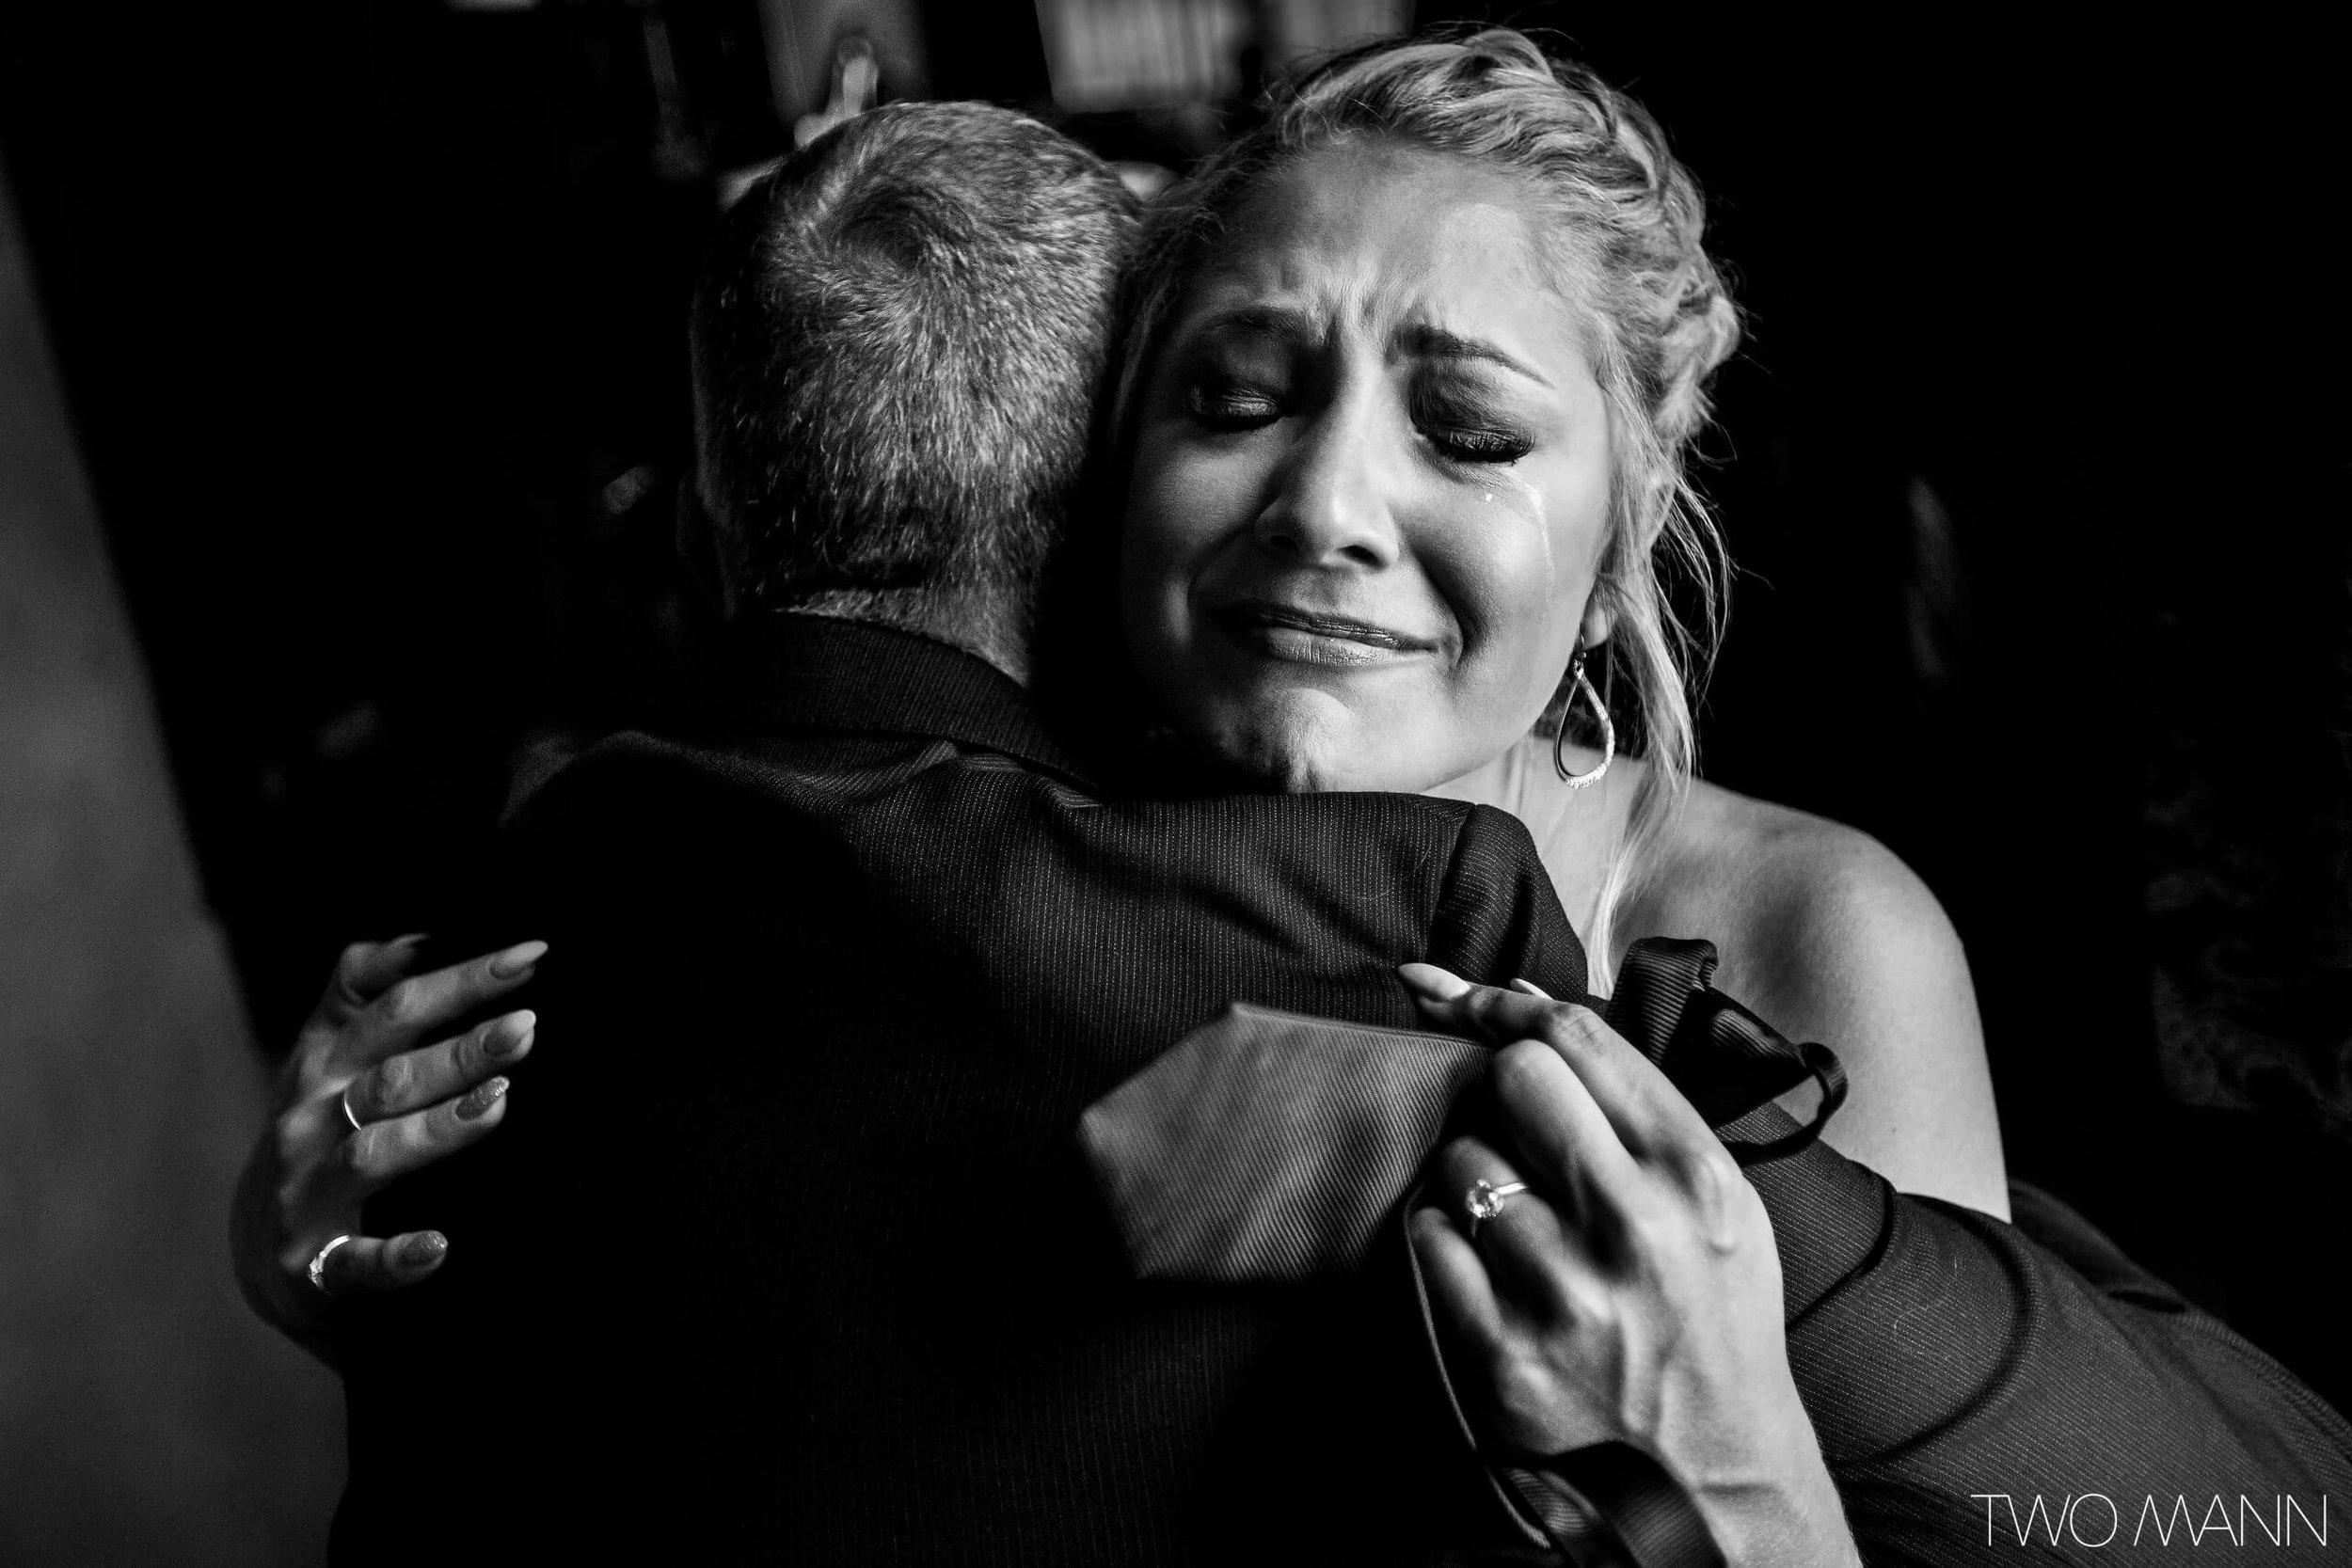 Two-Mann-Studios-Worlds-Best-Wedding-Photography-Best-of-2016-055-2560x1707.jpg